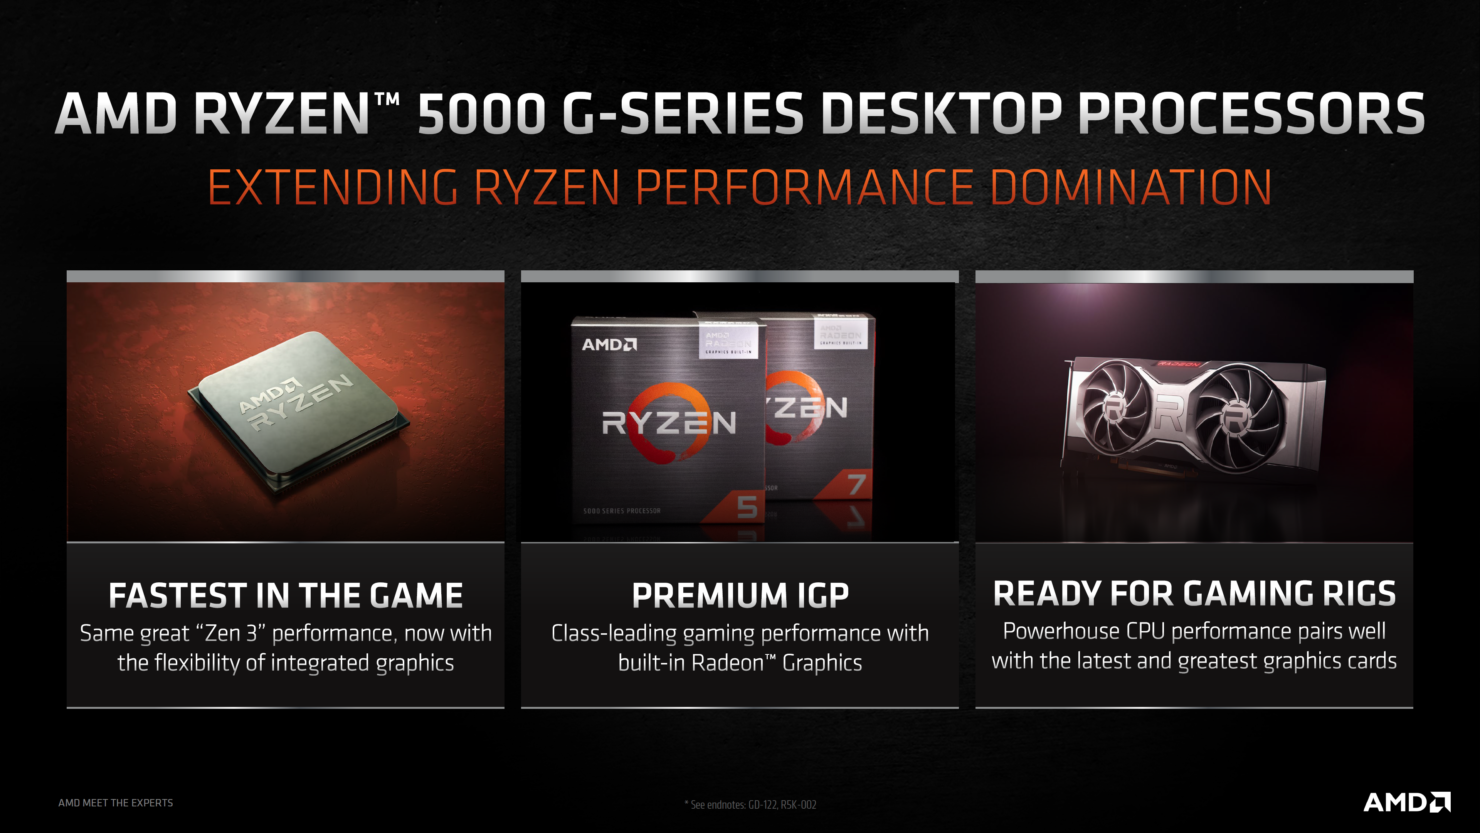 amd-ryzen-5000g-desktop-apus-launch-_-ryzen-7-5700g-ryzen-5-5600g-_2